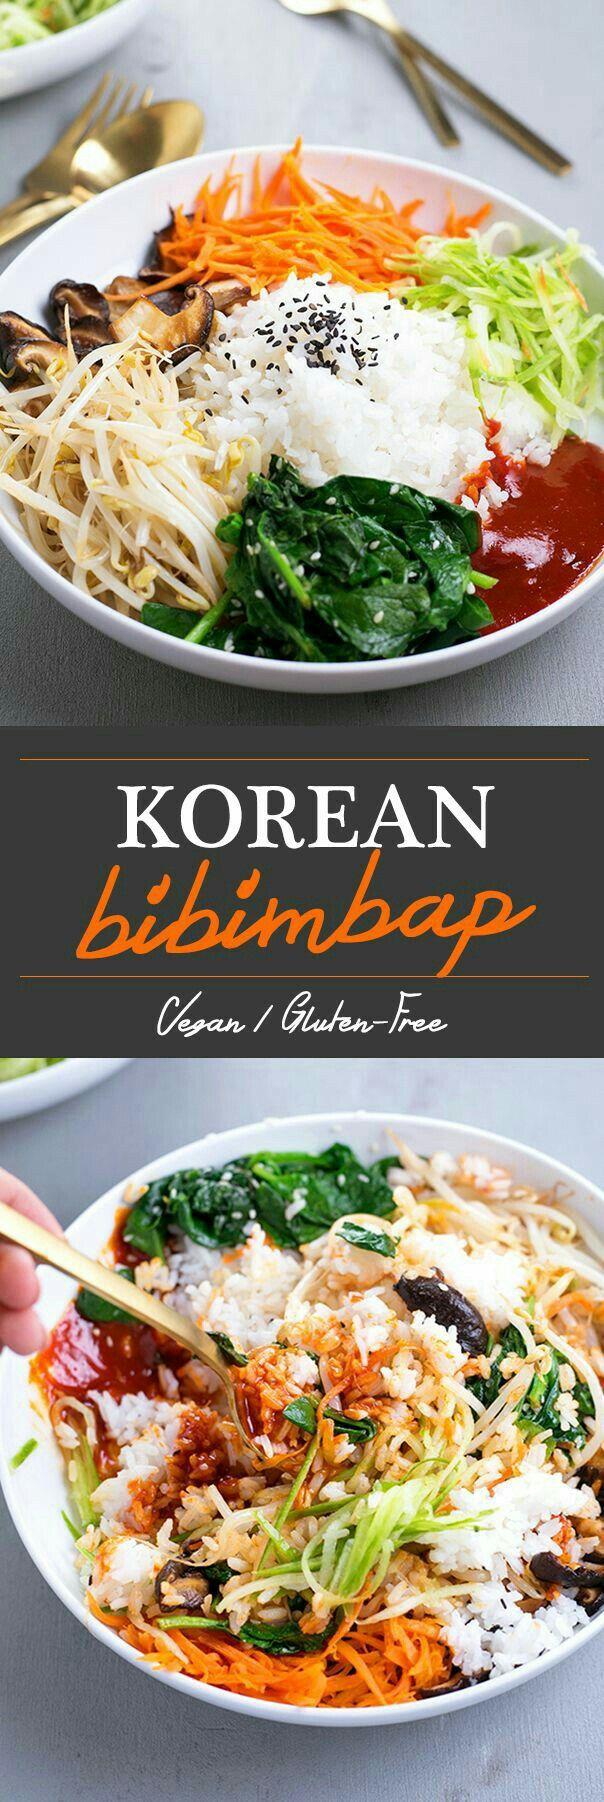 Vegan Korean Bibimbap - A classic Korean dish of rice and seasonal sautéed vegetables, served with a spicy Gochujang chilli sauce.